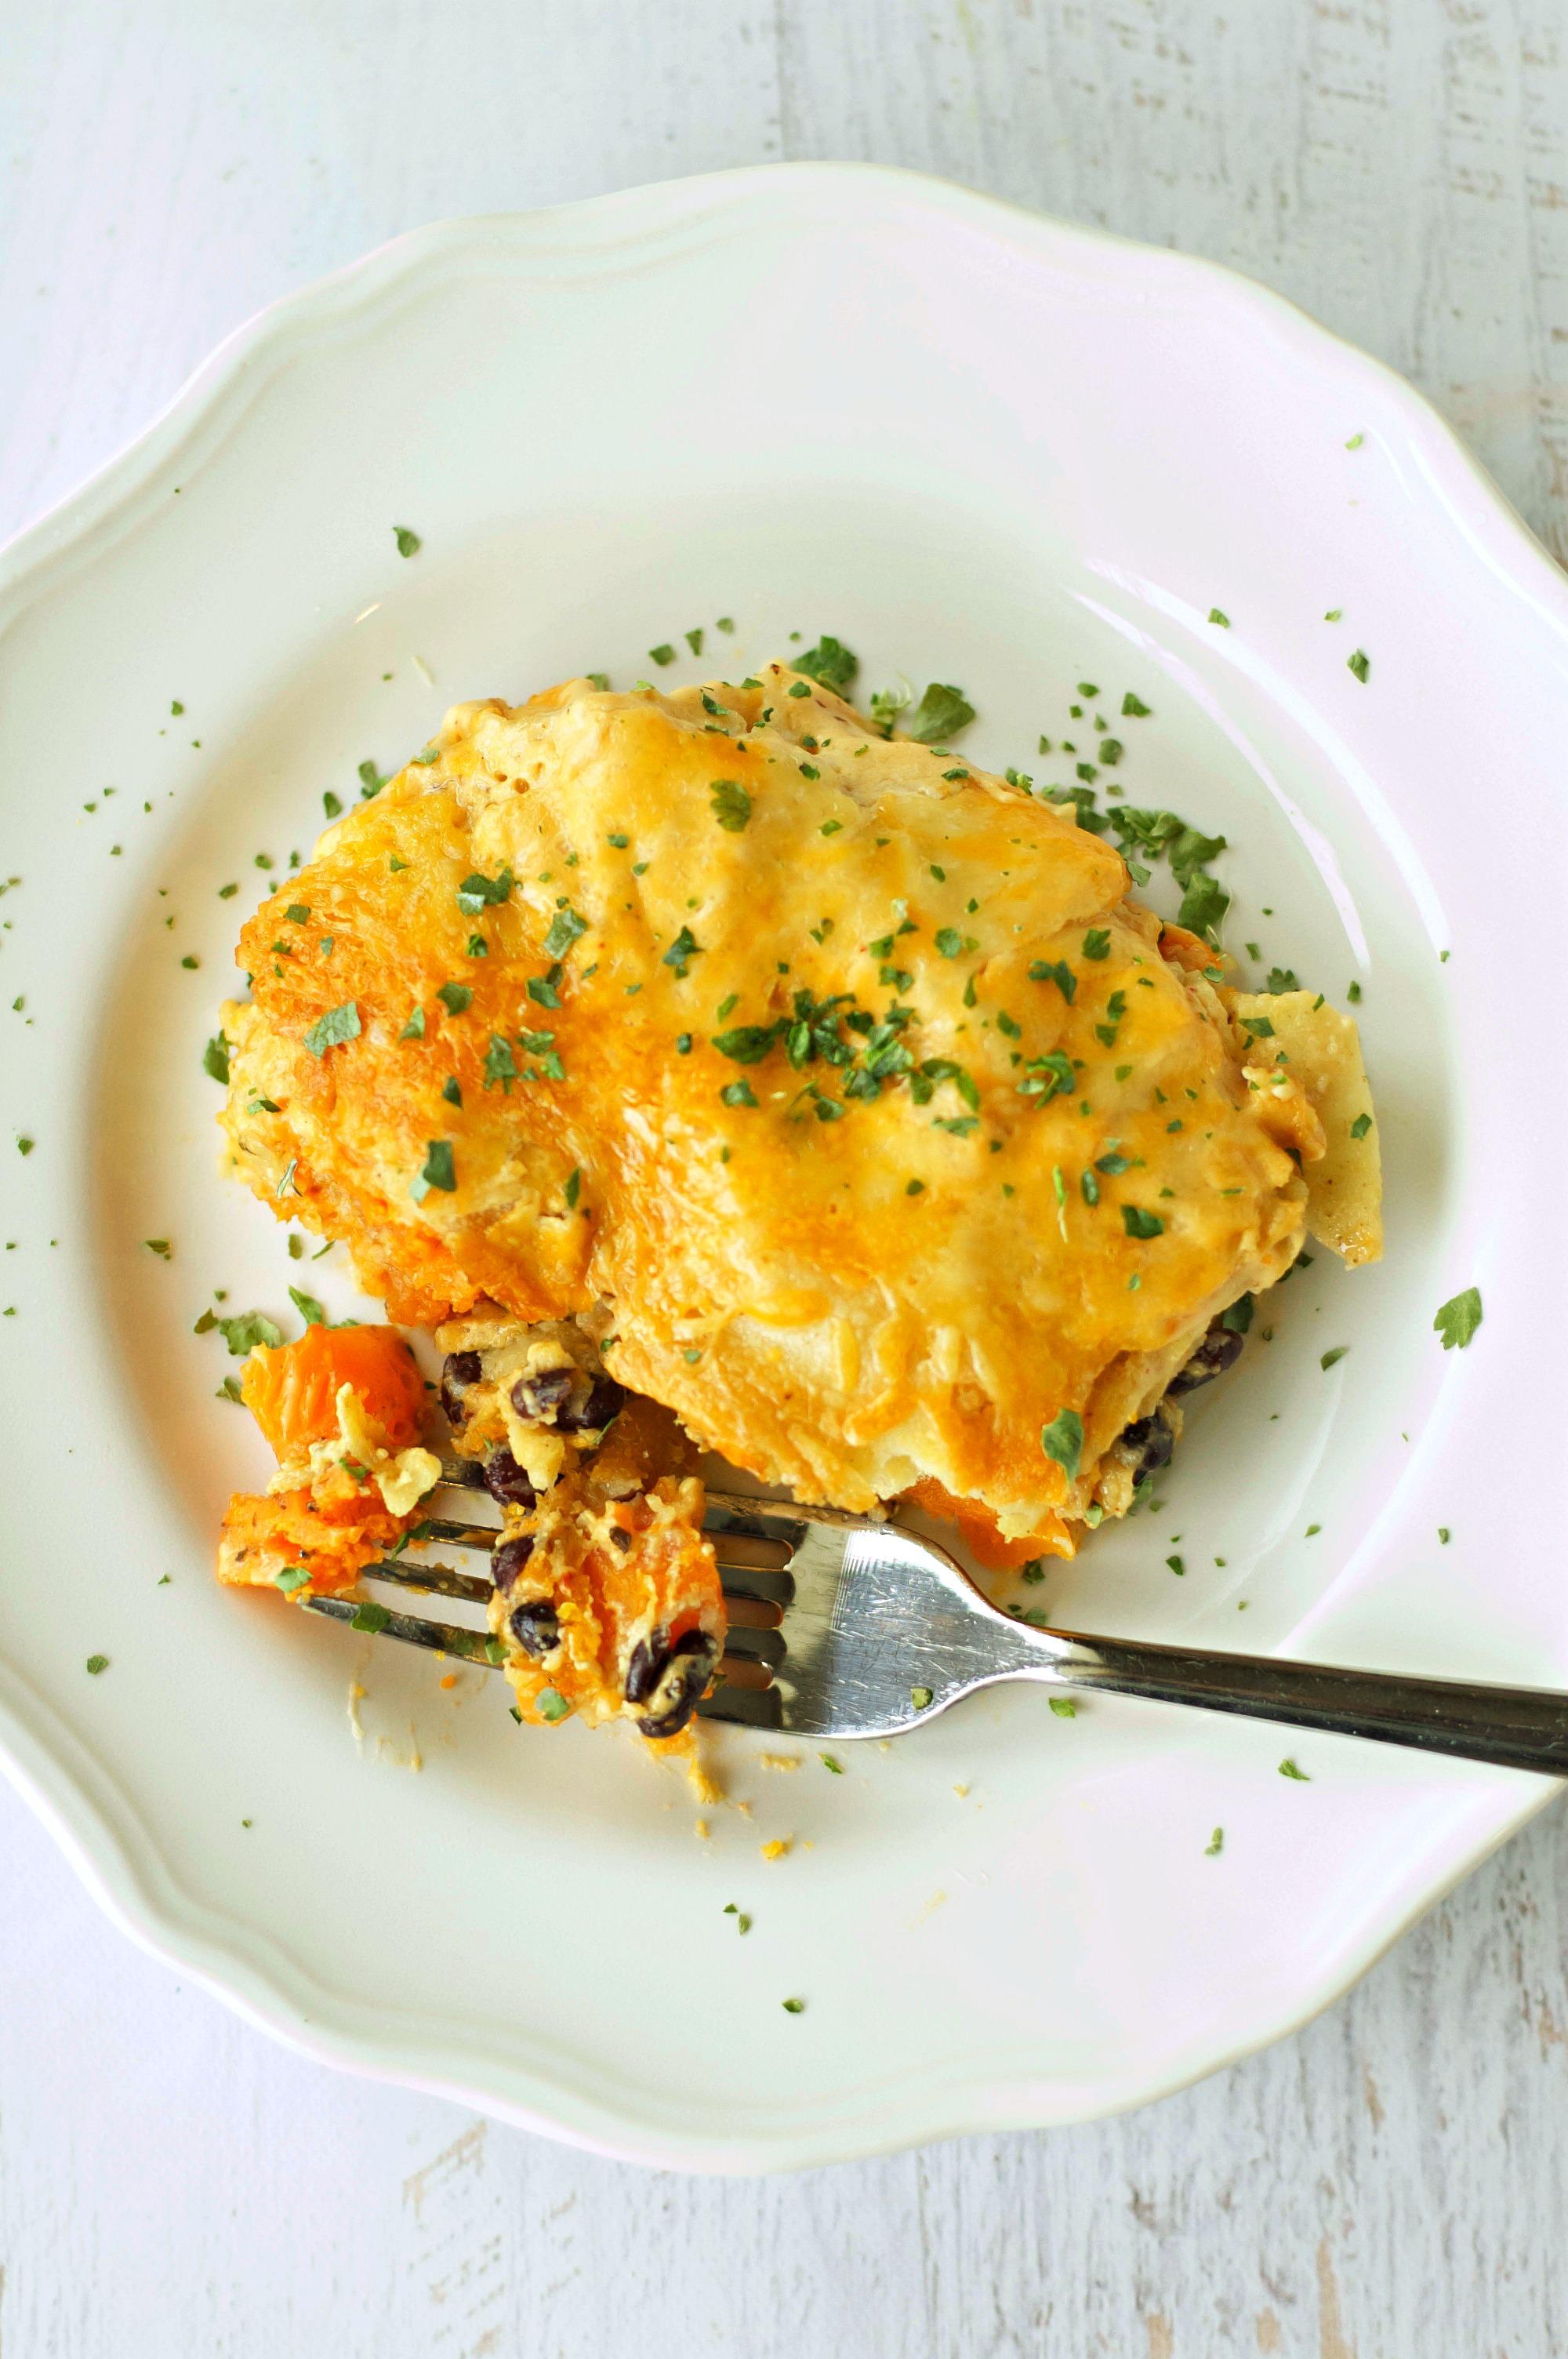 Crockpot Creamy Chipotle Sweet Potato Enchiladas | Crockpot Gourmet